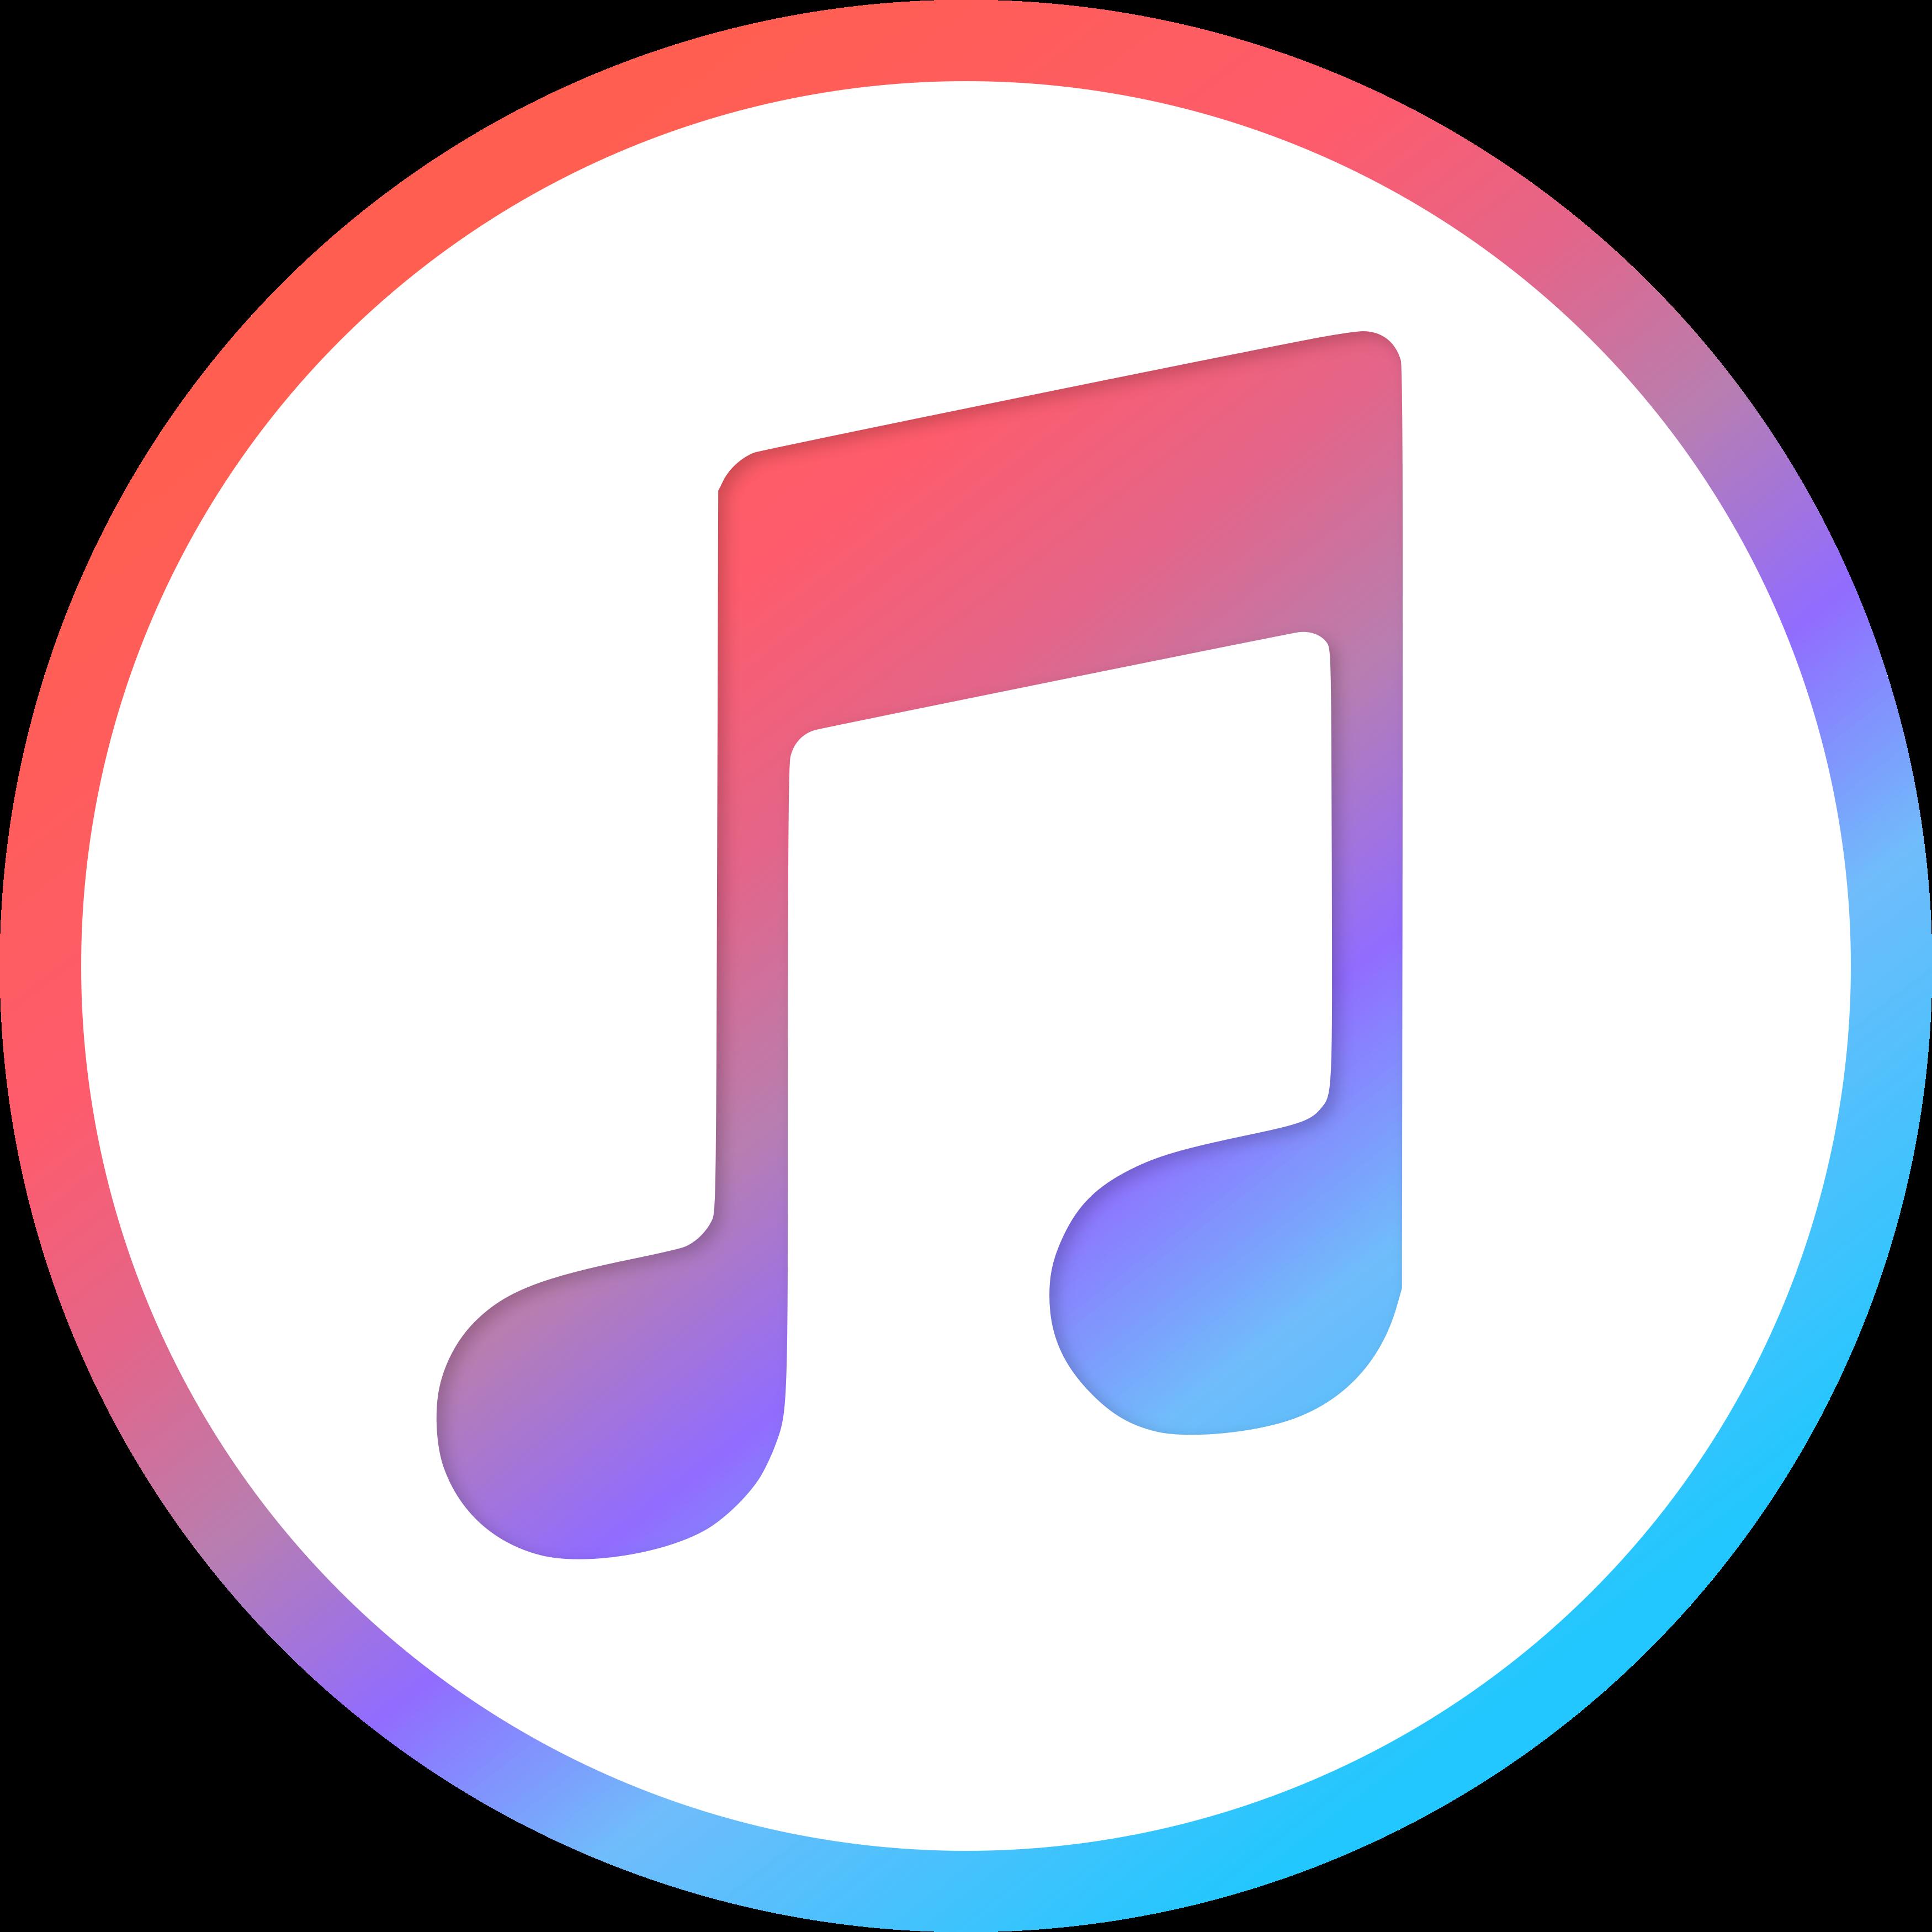 itunes logo 1 - iTunes Logo